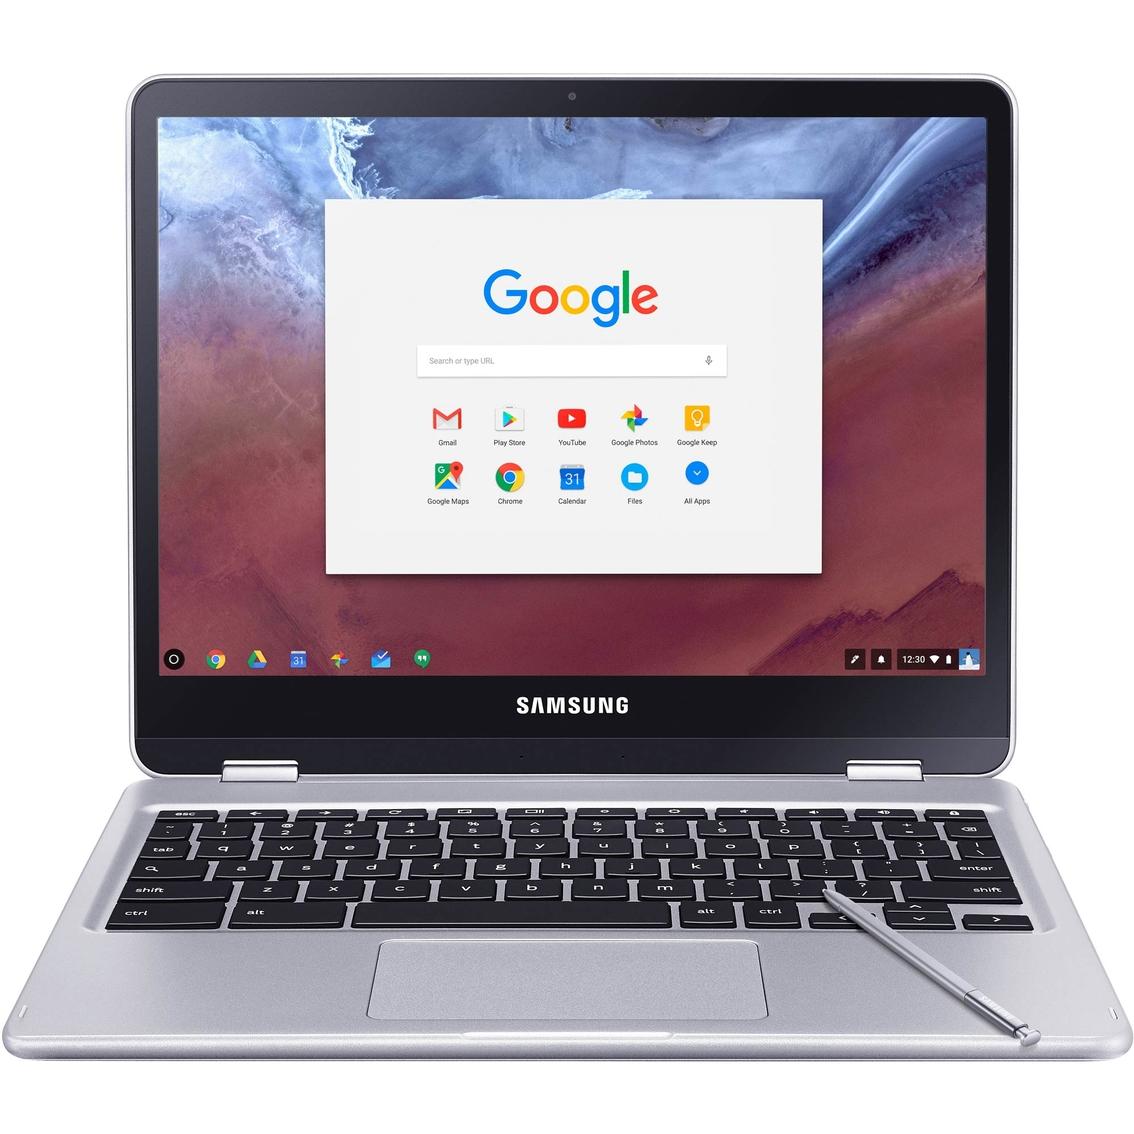 Samsung Chromebook Plus 12 3 In  Hexacore 2ghz 4gb 32gb Notebook